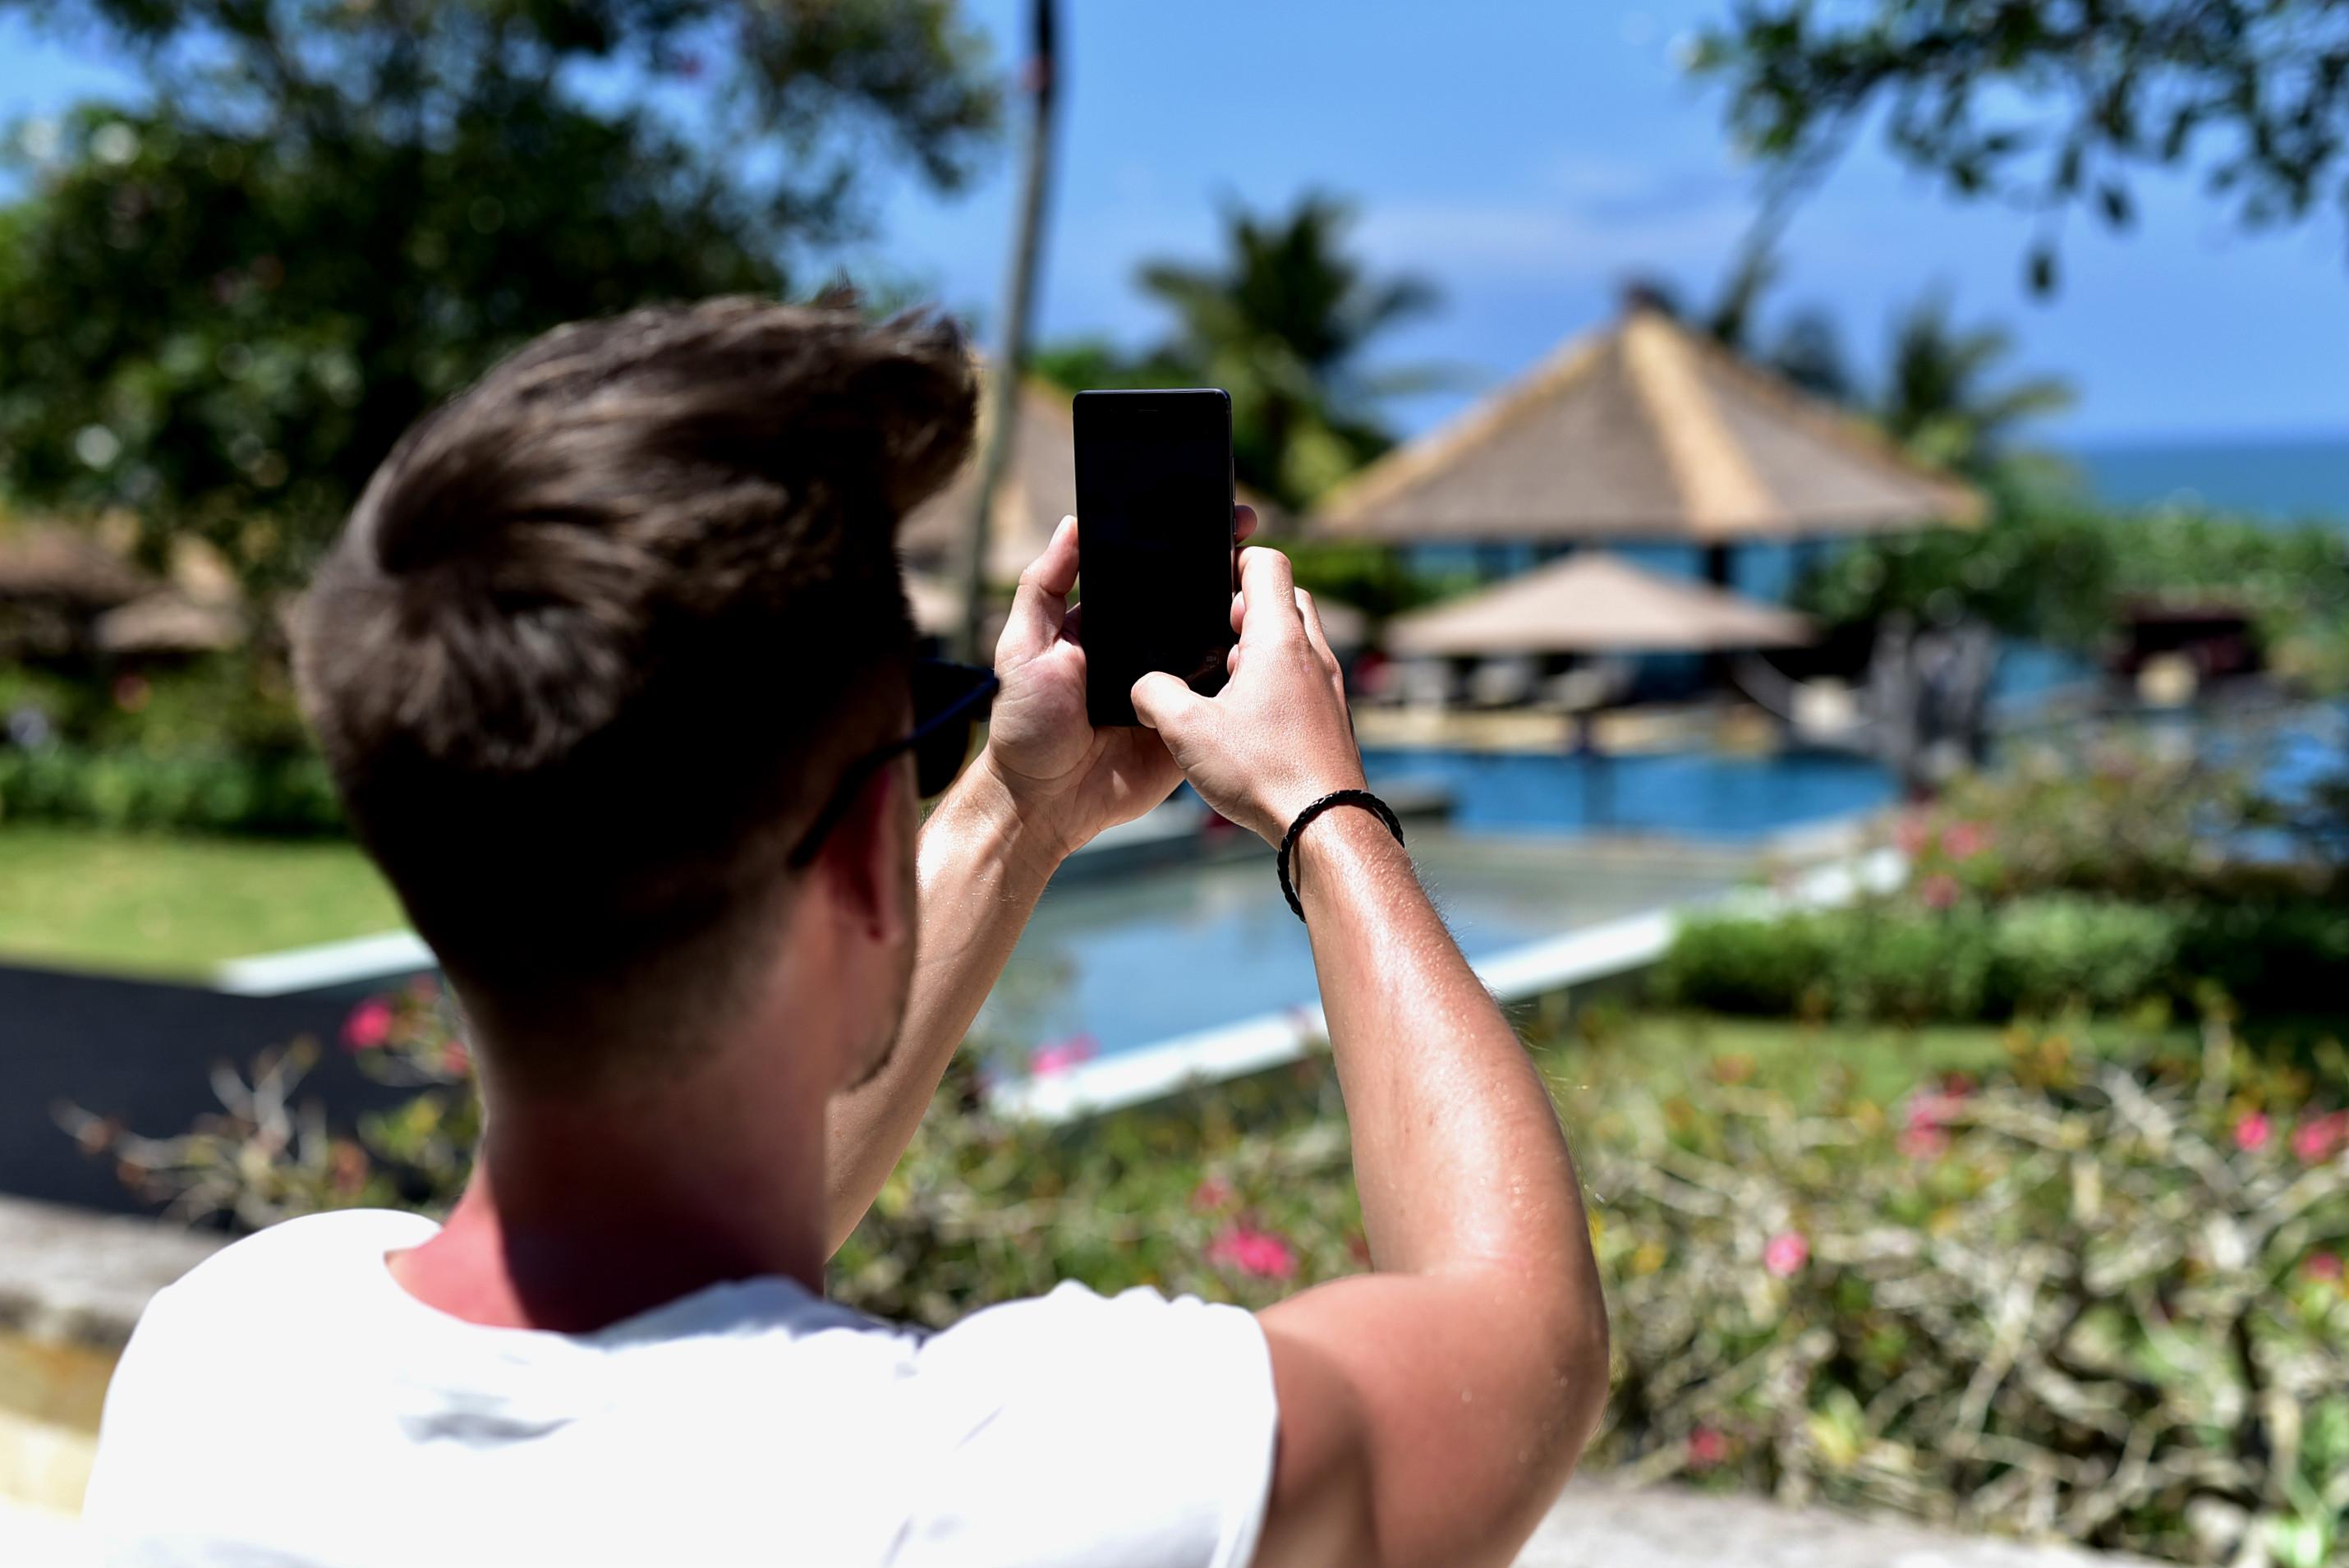 Tommeezjerry-Styleblog-Männerblog-Männer-Modeblog-Berlin-Berlinblog-Männermodeblog-Travelblog-Reiseblog-Bali-Indonesien-Indonesia-Huawei-P9-2016-Smartphone-Ayana-Resort